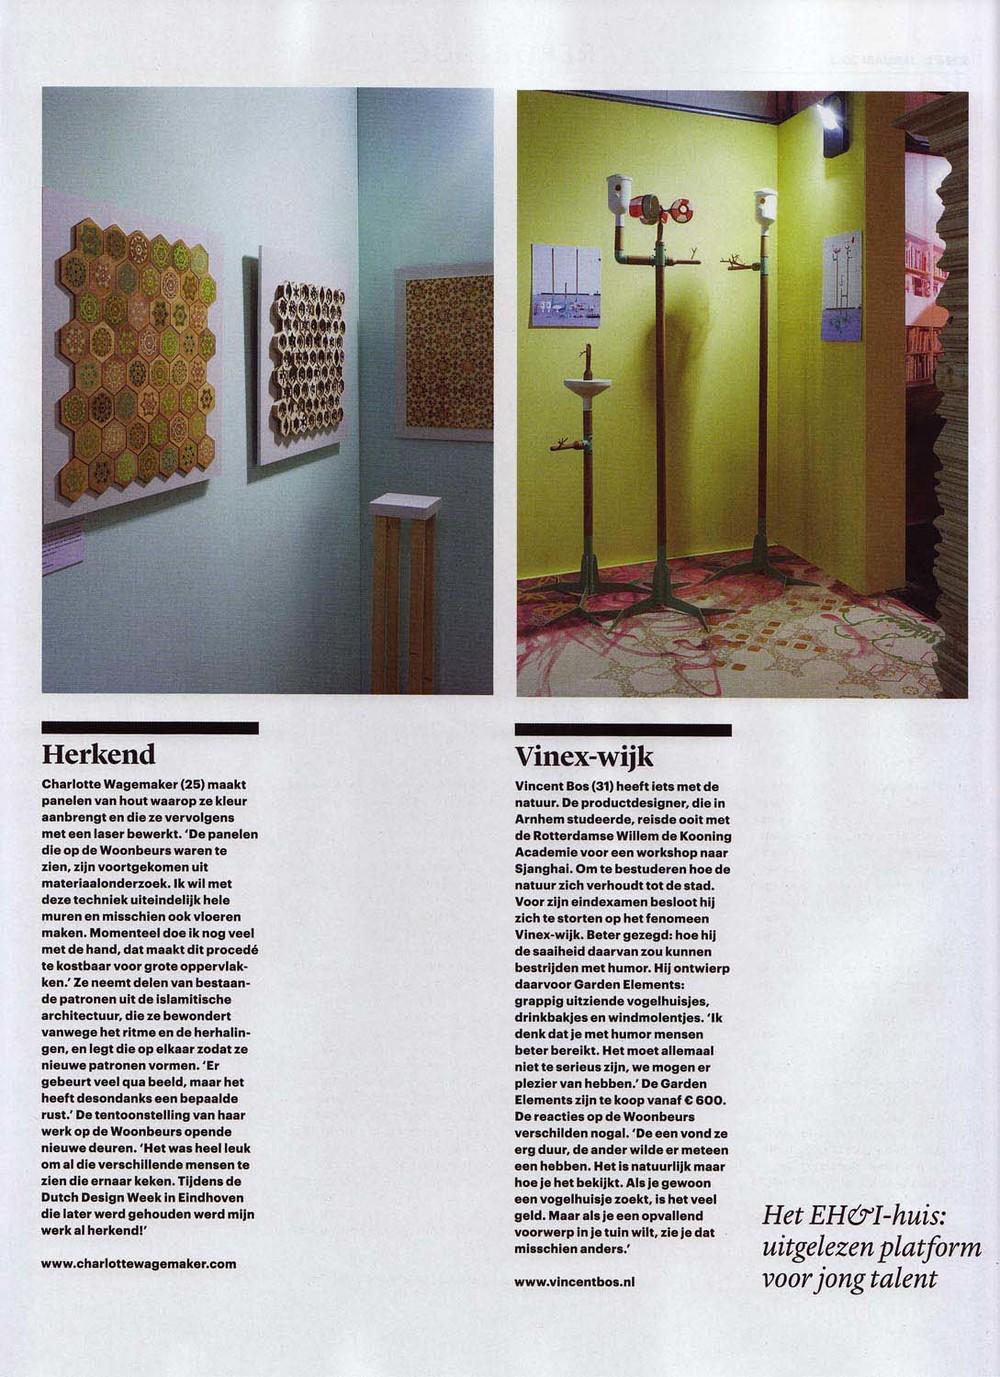 Vincent_Bos_Ontwerpen_Eigenhuis_&_Interieur_Publicatie.jpg